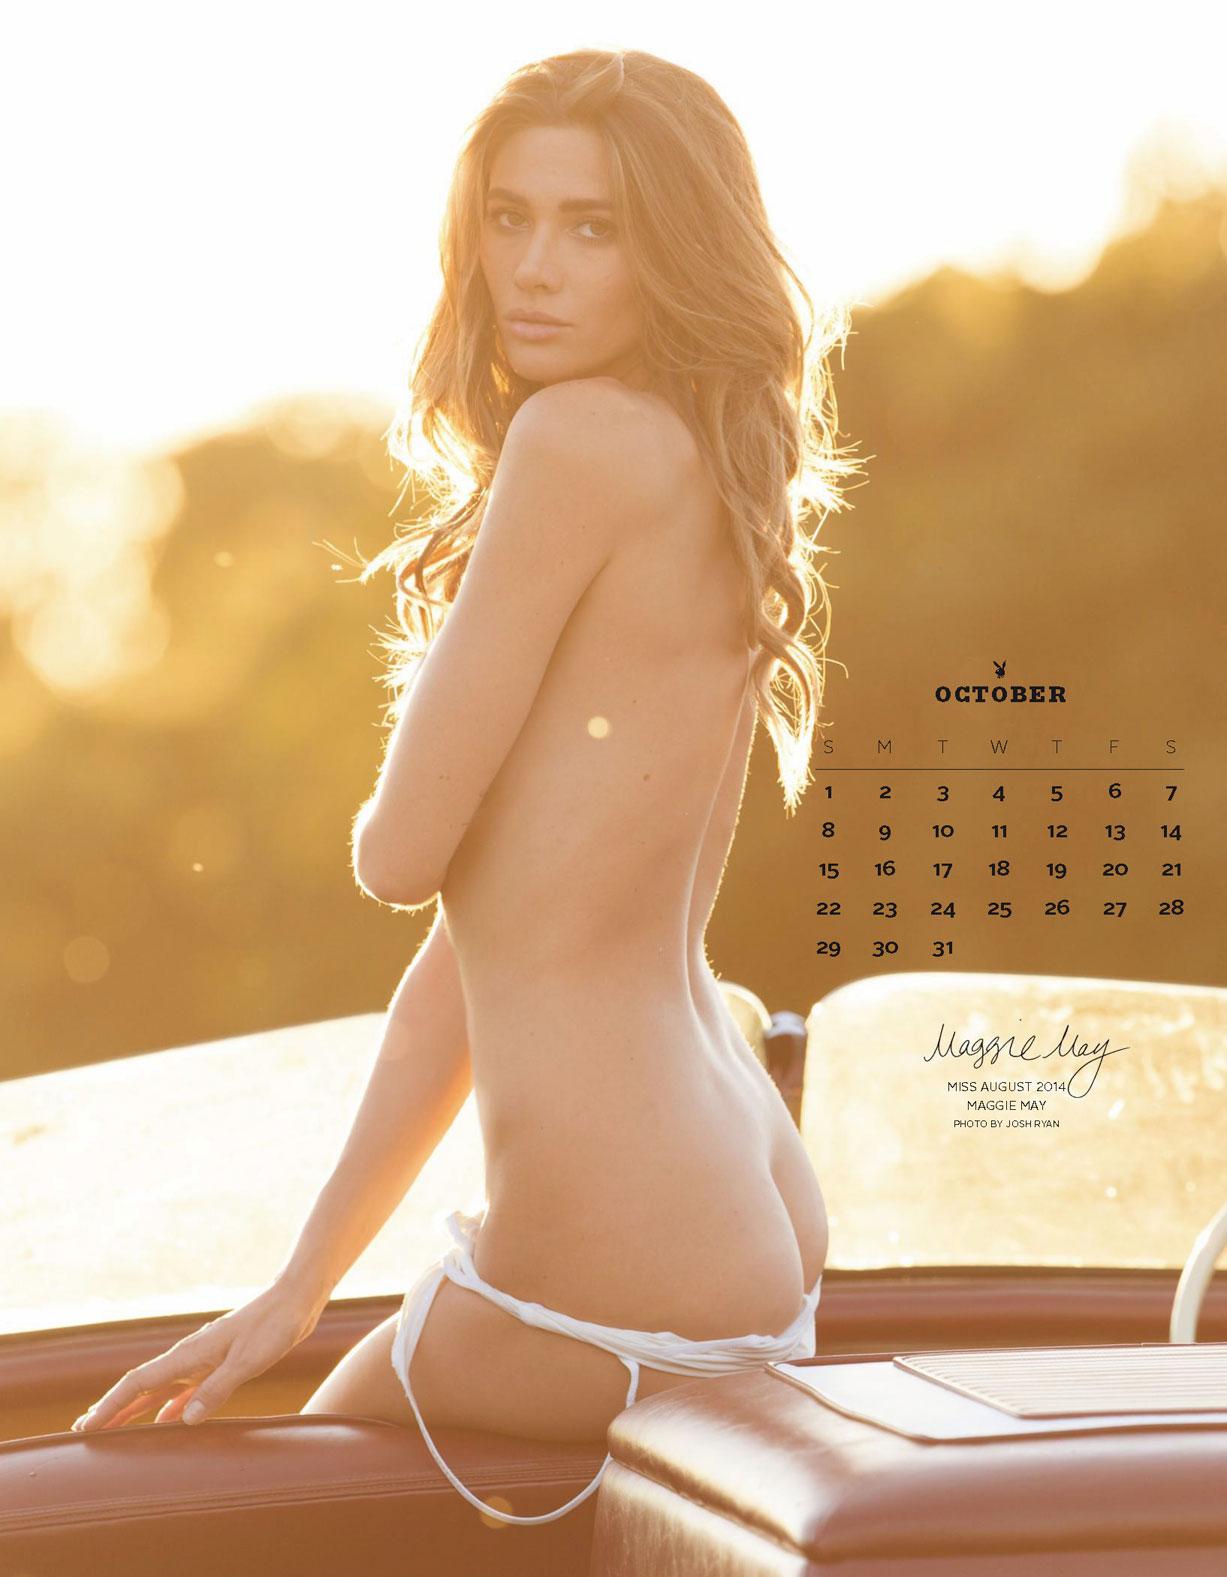 Playboy US Playmates 2017 calendar - Miss August 2014 Maggie May / Мэгги Мэй – Девушка месяца август 2014 журнала Плейбой США